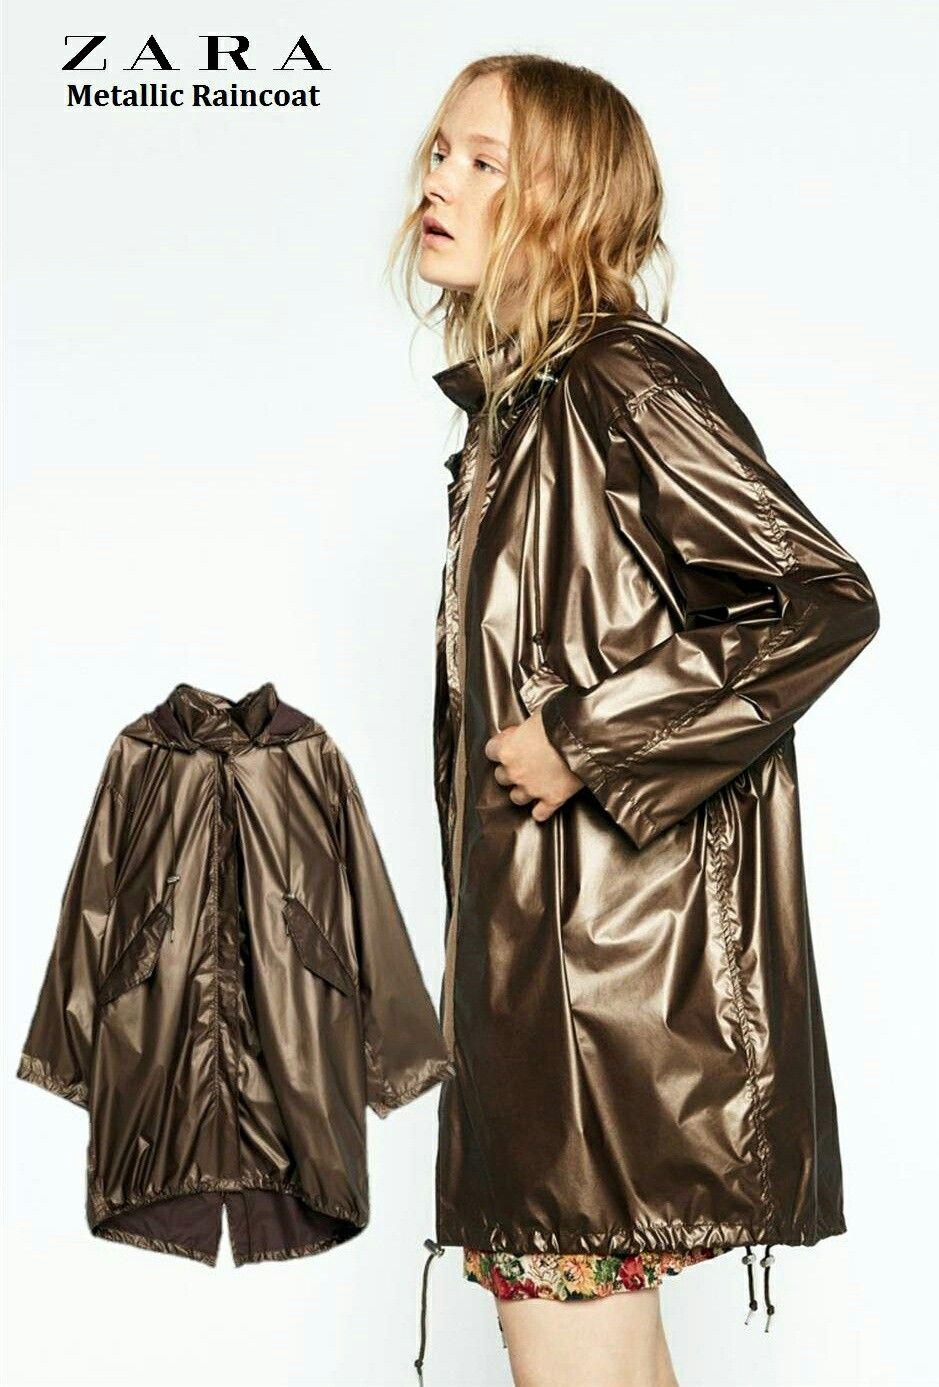 5bbc9d3ab4cc57 ZARA Metallic Raincoat- give this to me NOW Glanz, Regenmantel, Stil, Zara